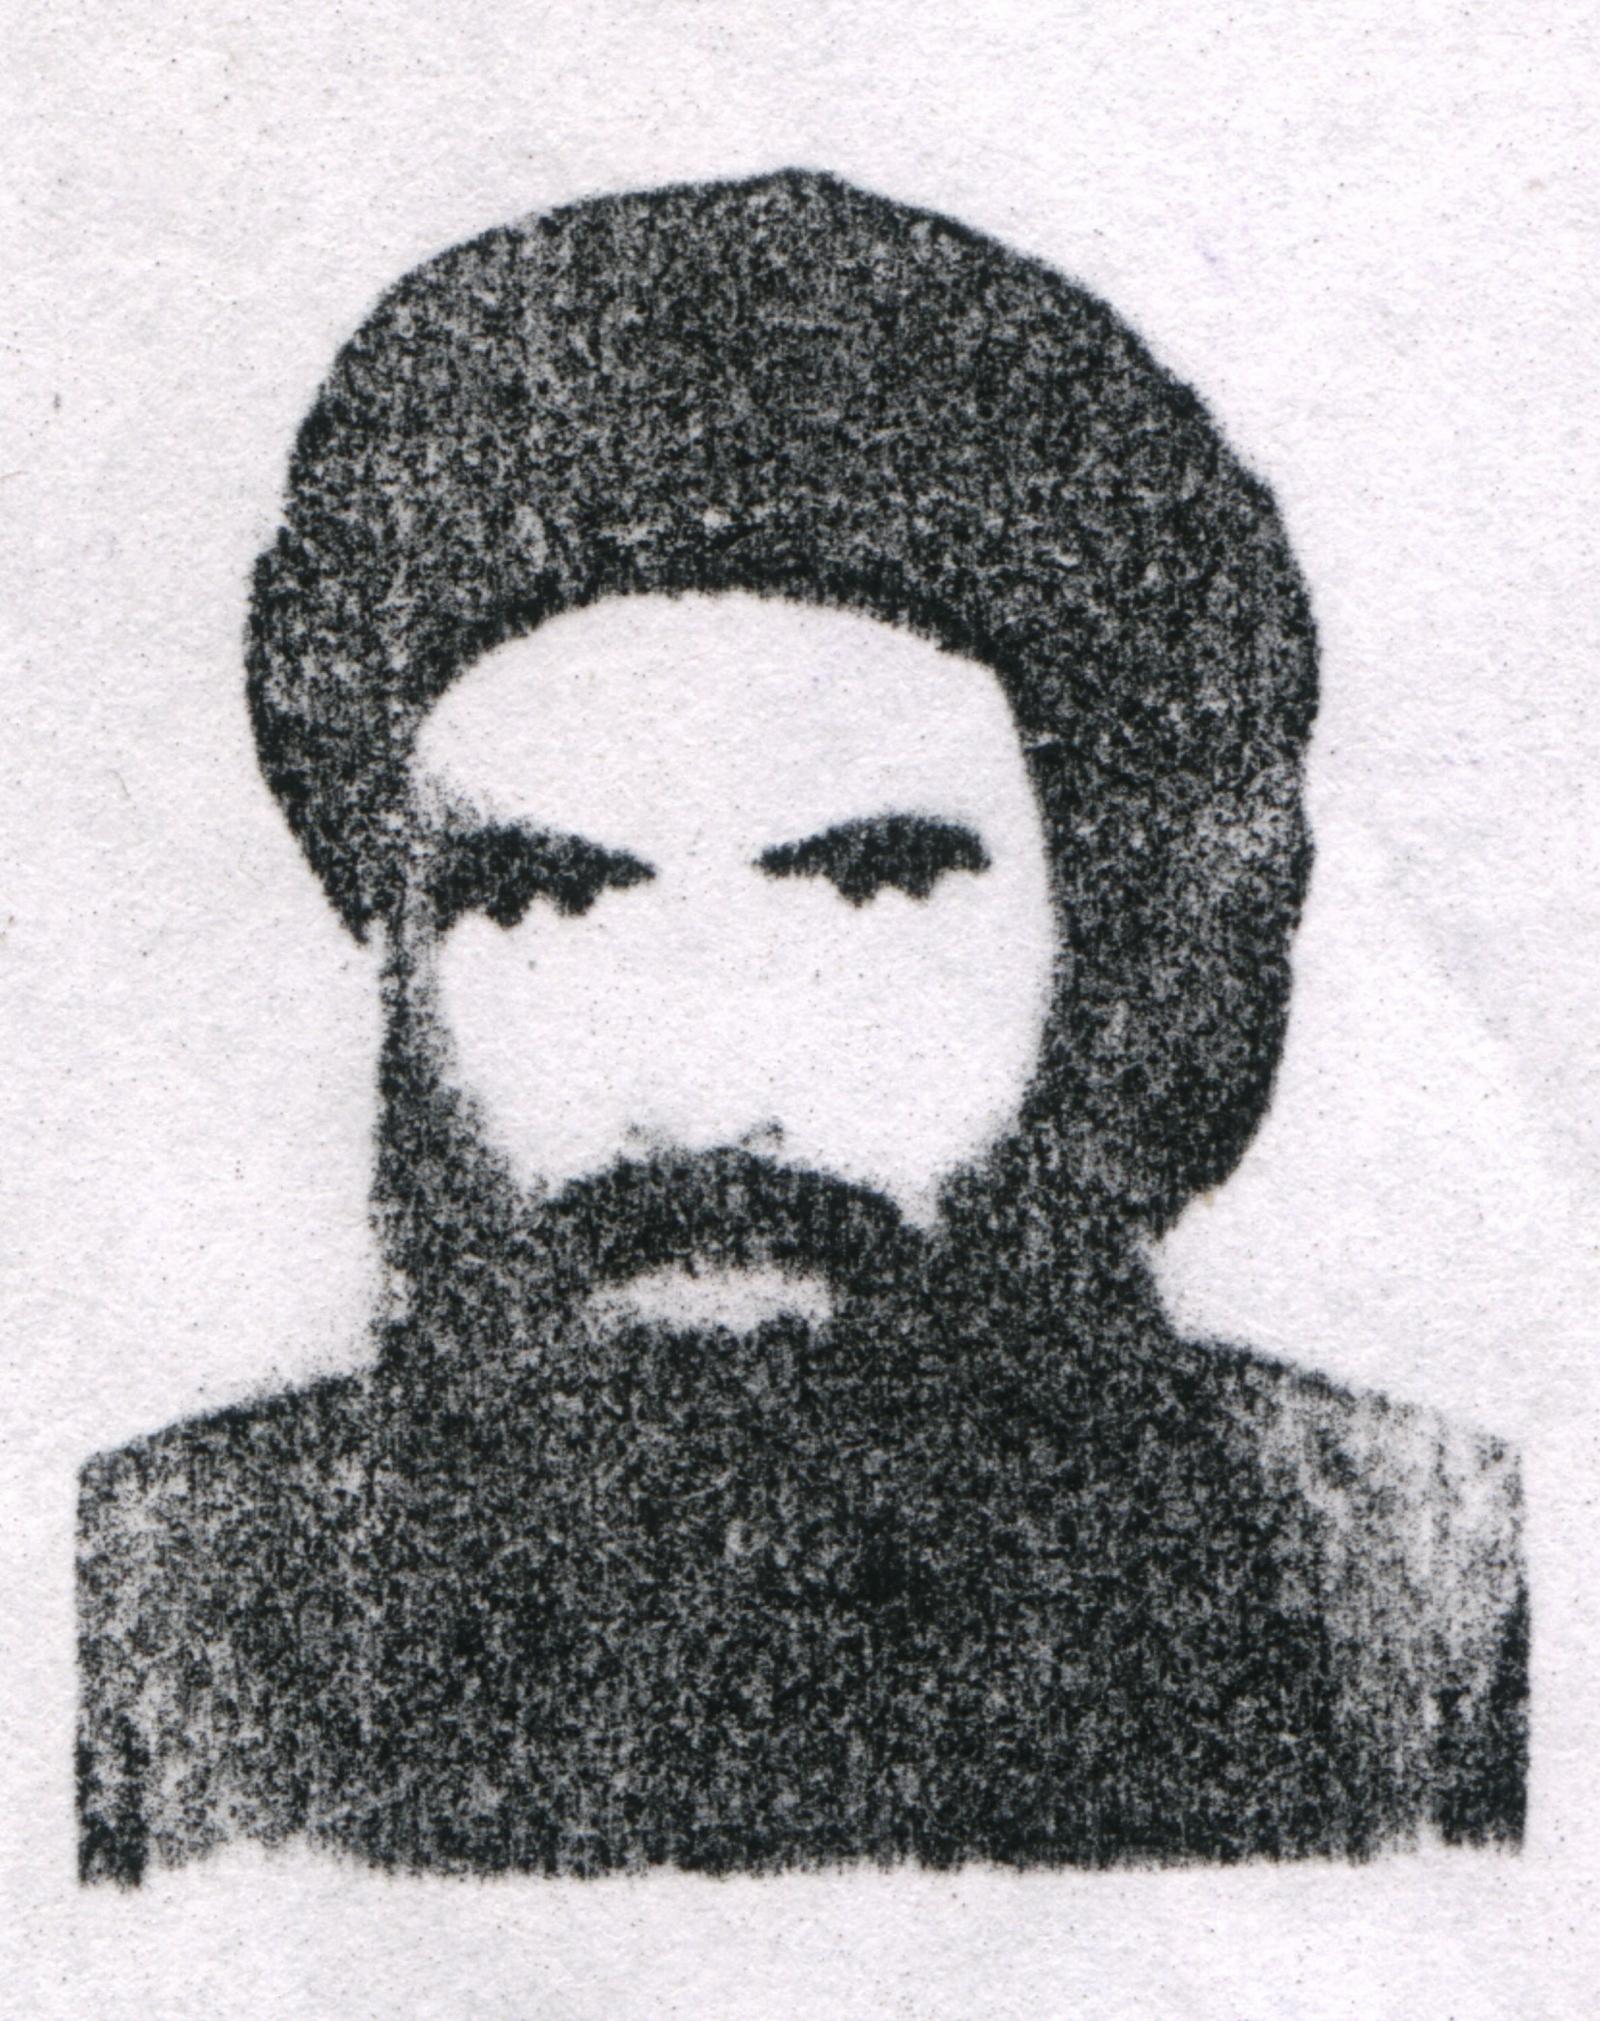 Taliban Chief Mullah Omar